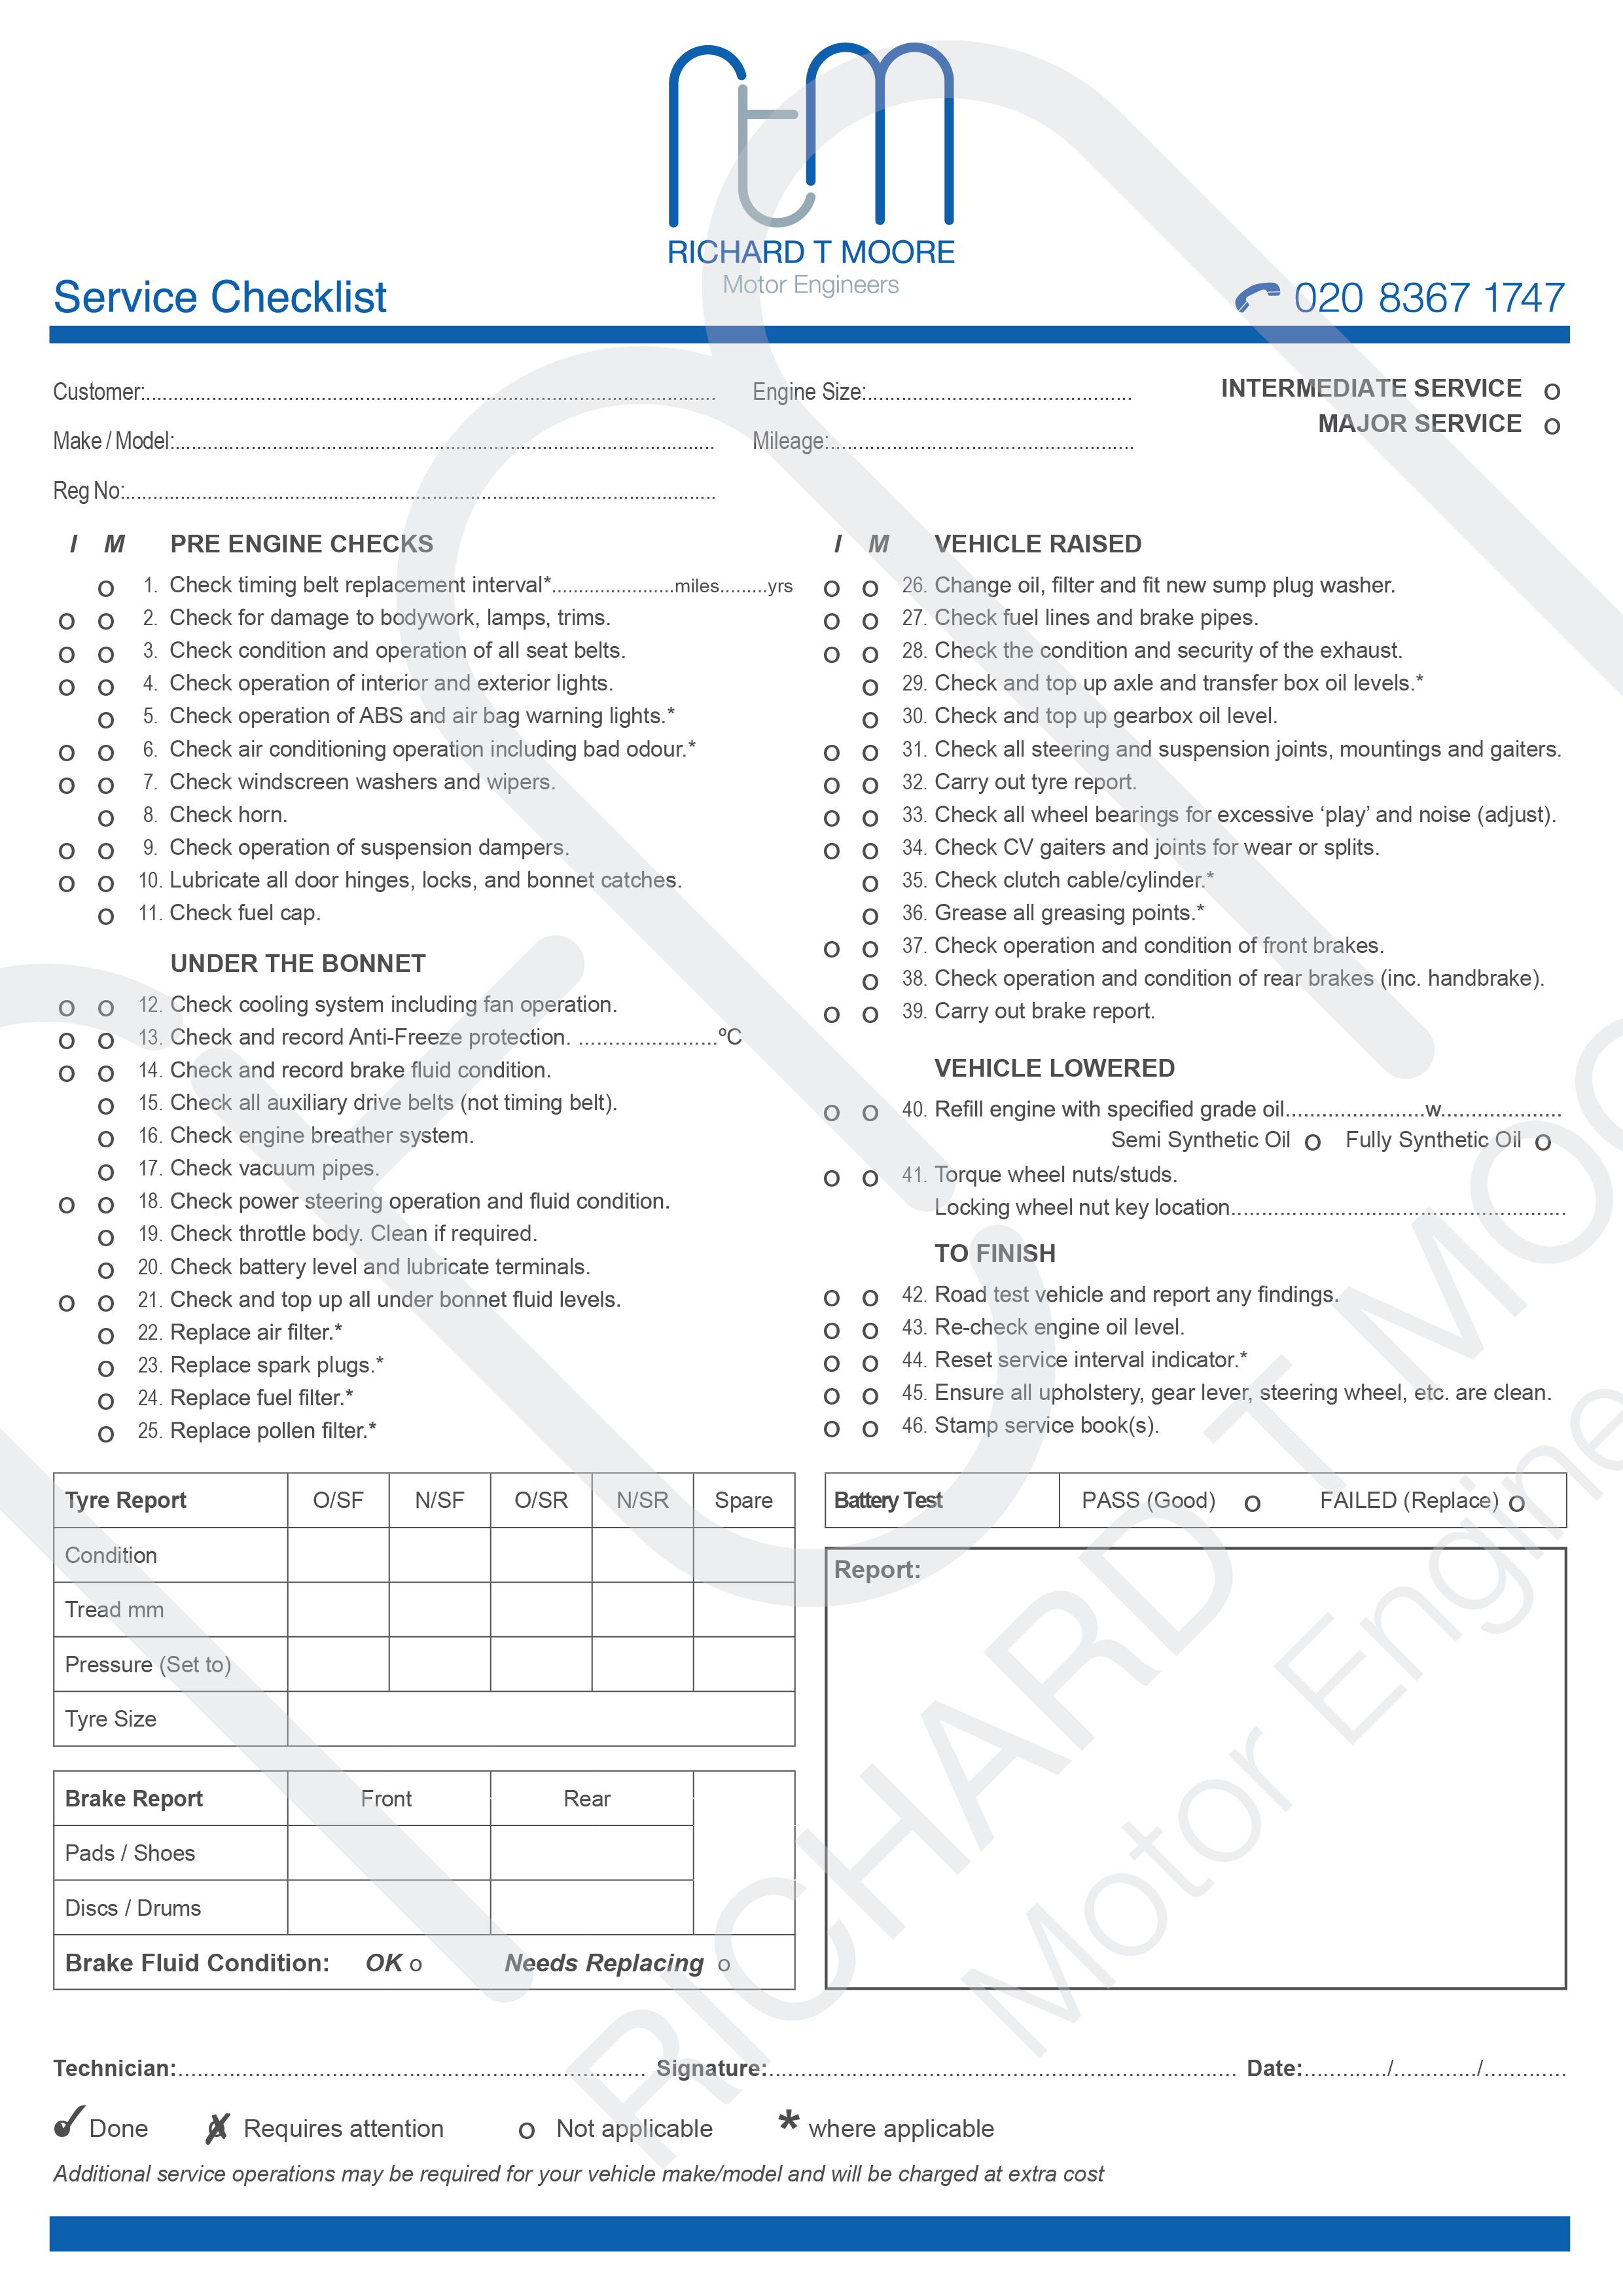 RTM Service Checklist Newlogo3 01